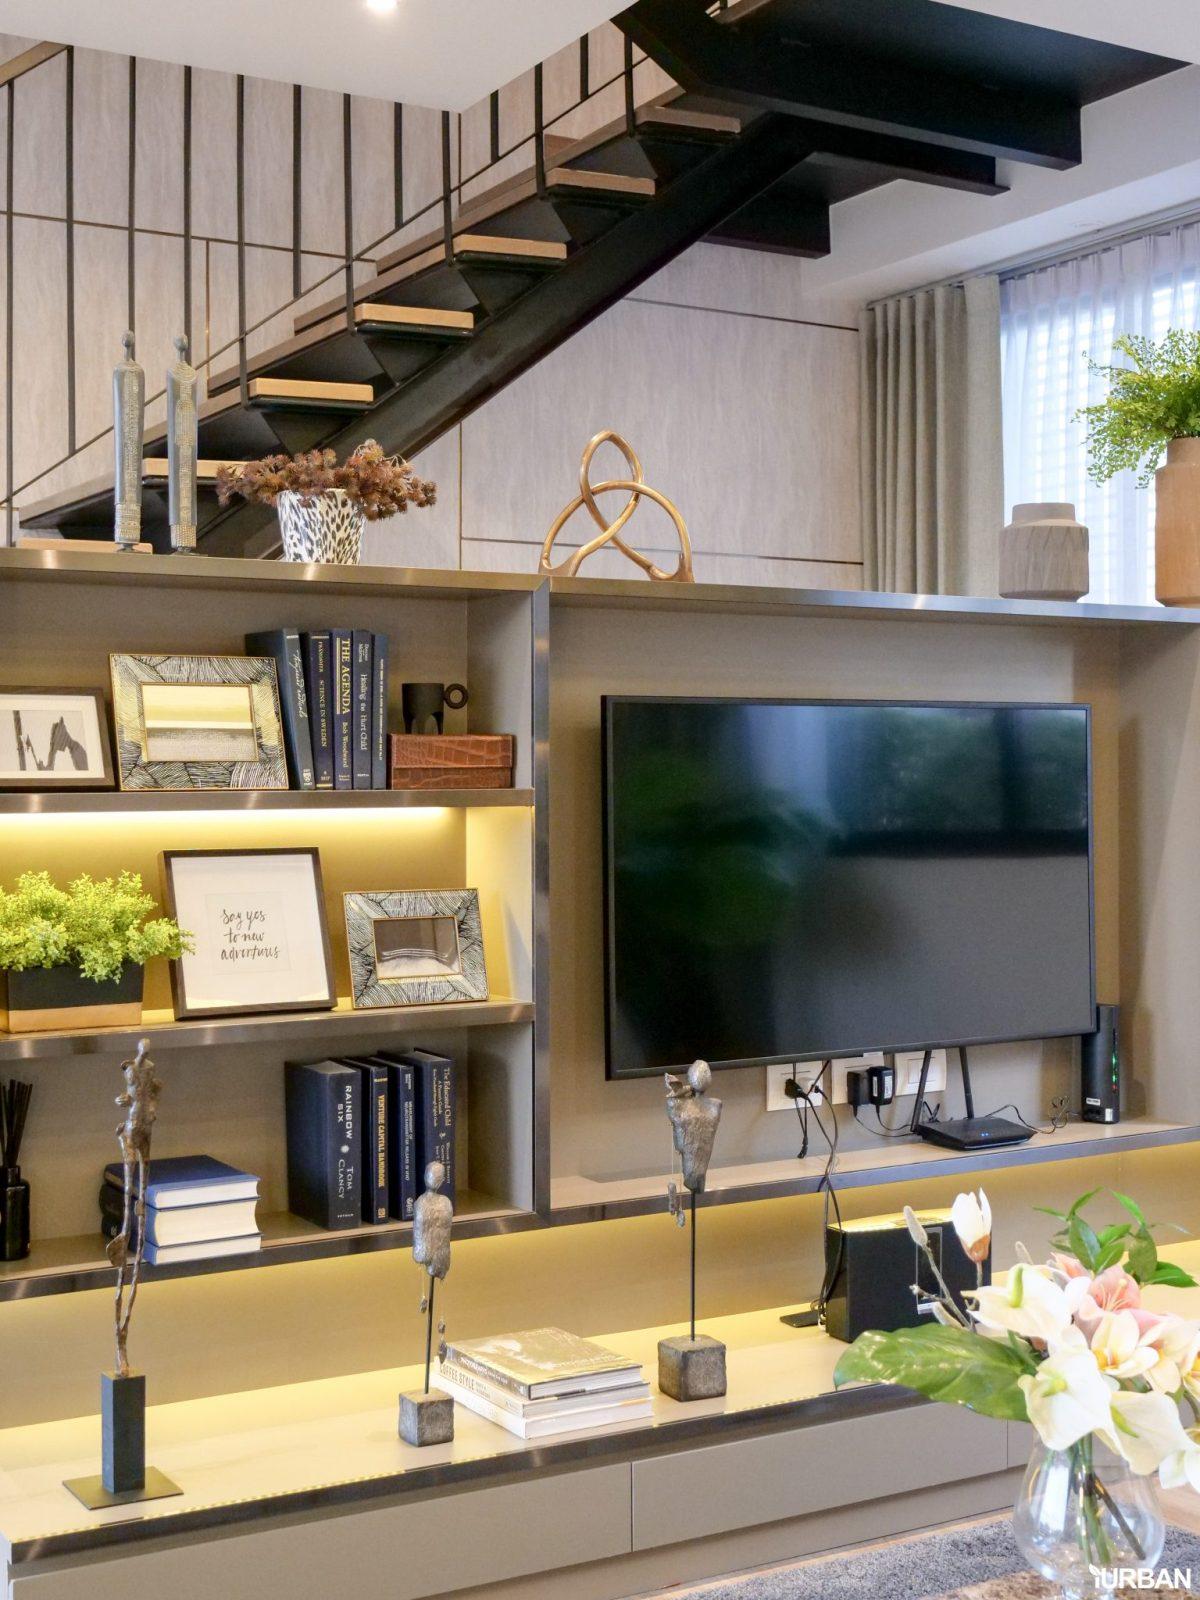 AIRES RAMA9 รีวิว Luxury Townhome 3.5 ชั้น + Rooftop ออกแบบสวย ย่านพระราม9 (ใกล้ รพ.สมิติเวช) 47 - AIRES